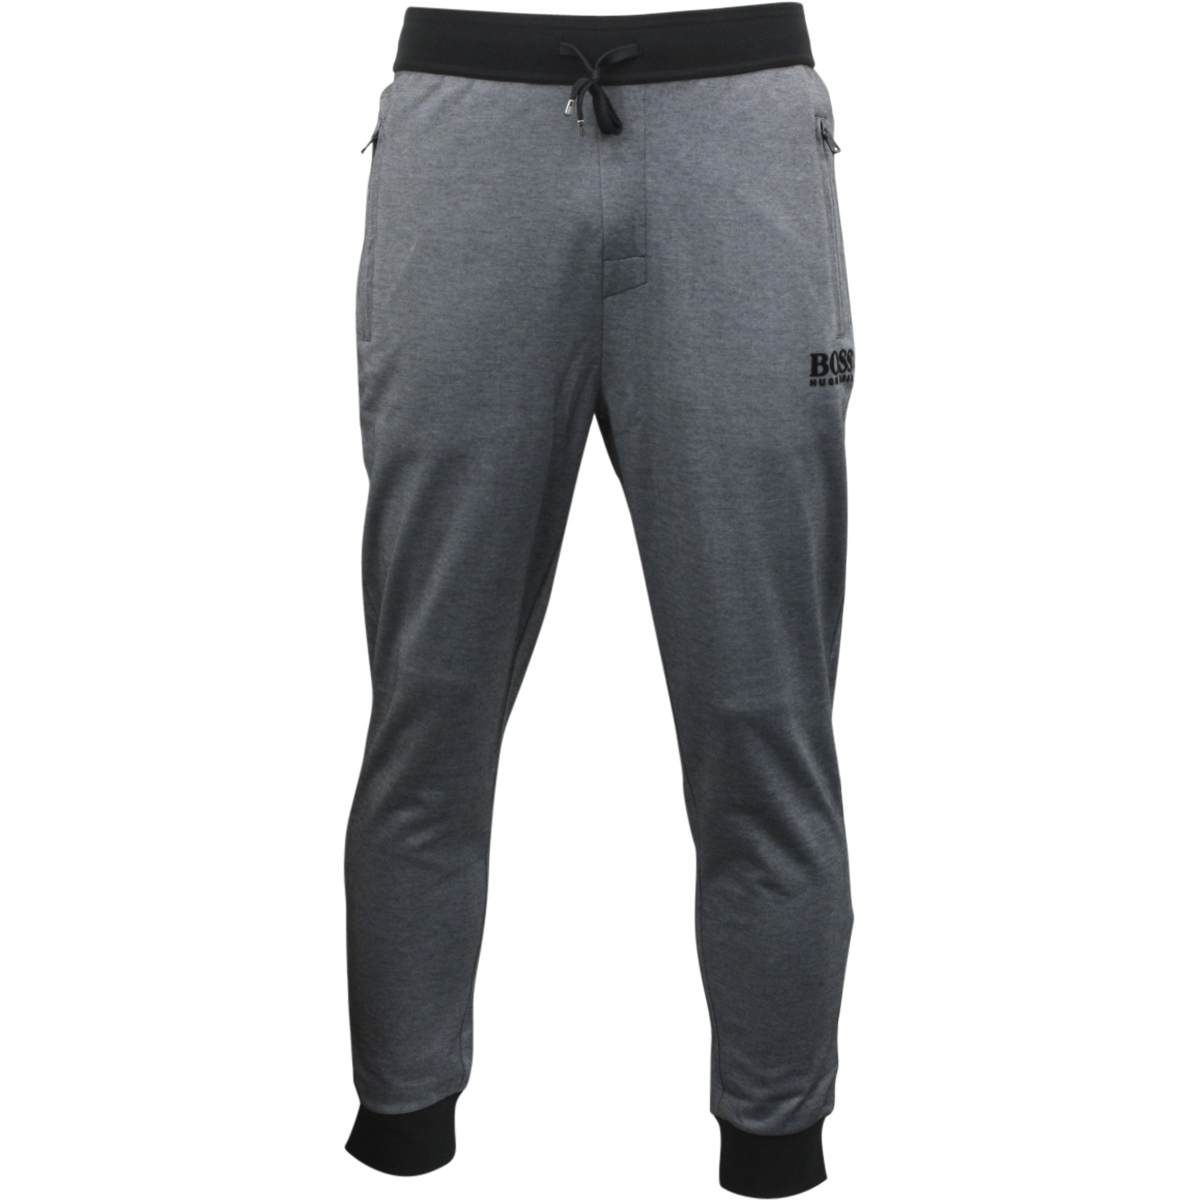 e6591674 Details about Hugo Boss Men's Long Black Contrast Cuffs Drawstring Lounge  Sweatpants Sz: XL